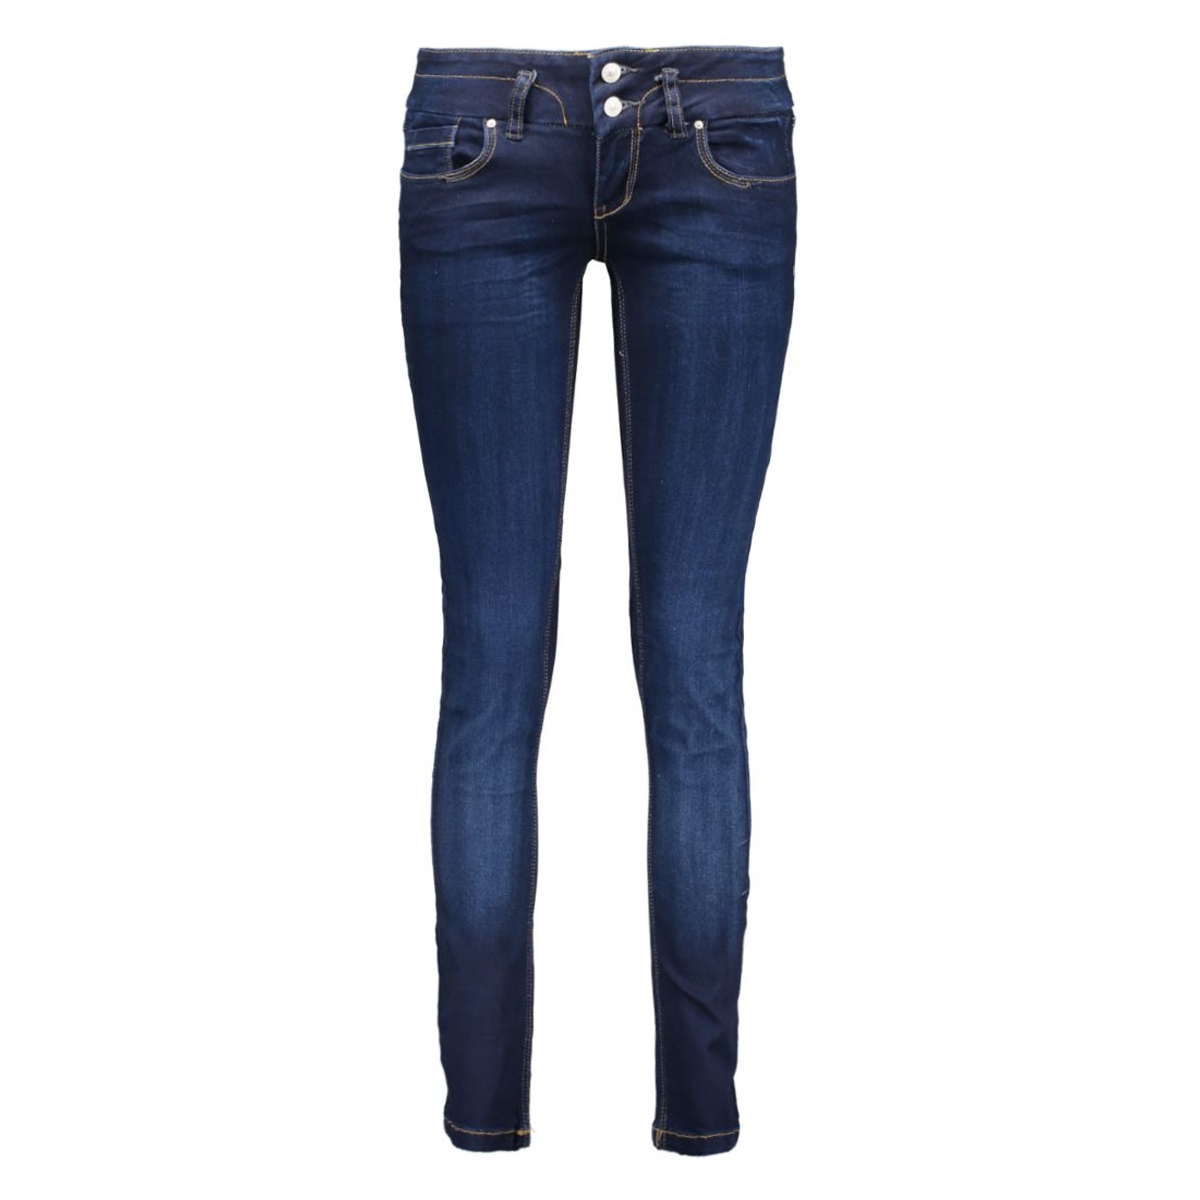 100950618.12585 ltb jeans aceline wash